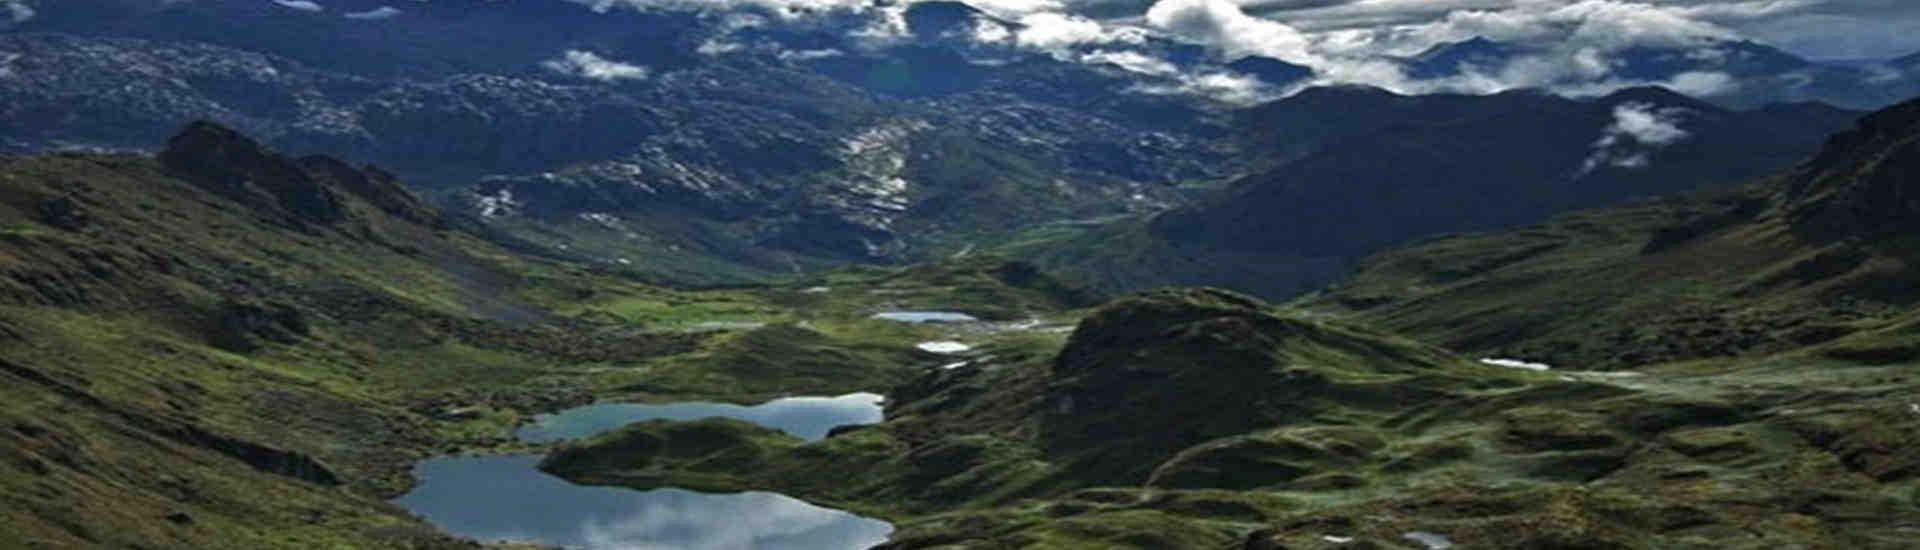 valle lares trek machu picchu toursperumachupicchu agencia de viajes en peruvian